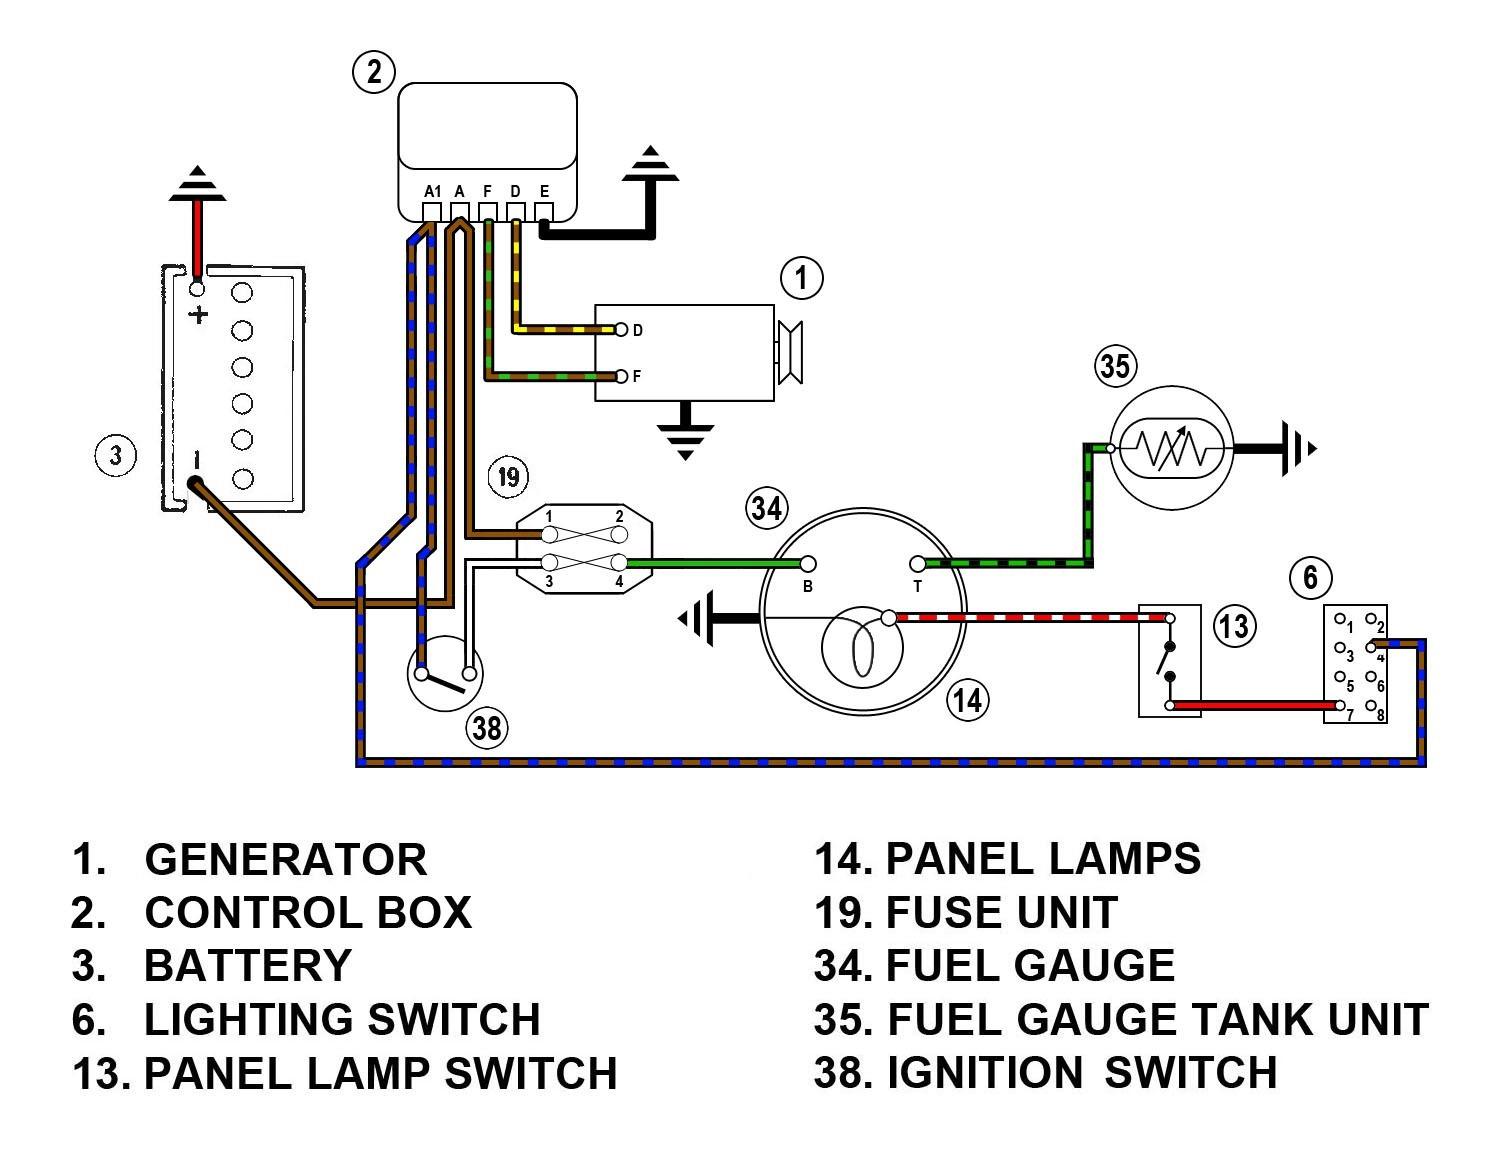 Autometer Tach Wiring Diagram New Equus Fuel Gauge Wiring Diagram Canopi Regarding Auto Meter Tach